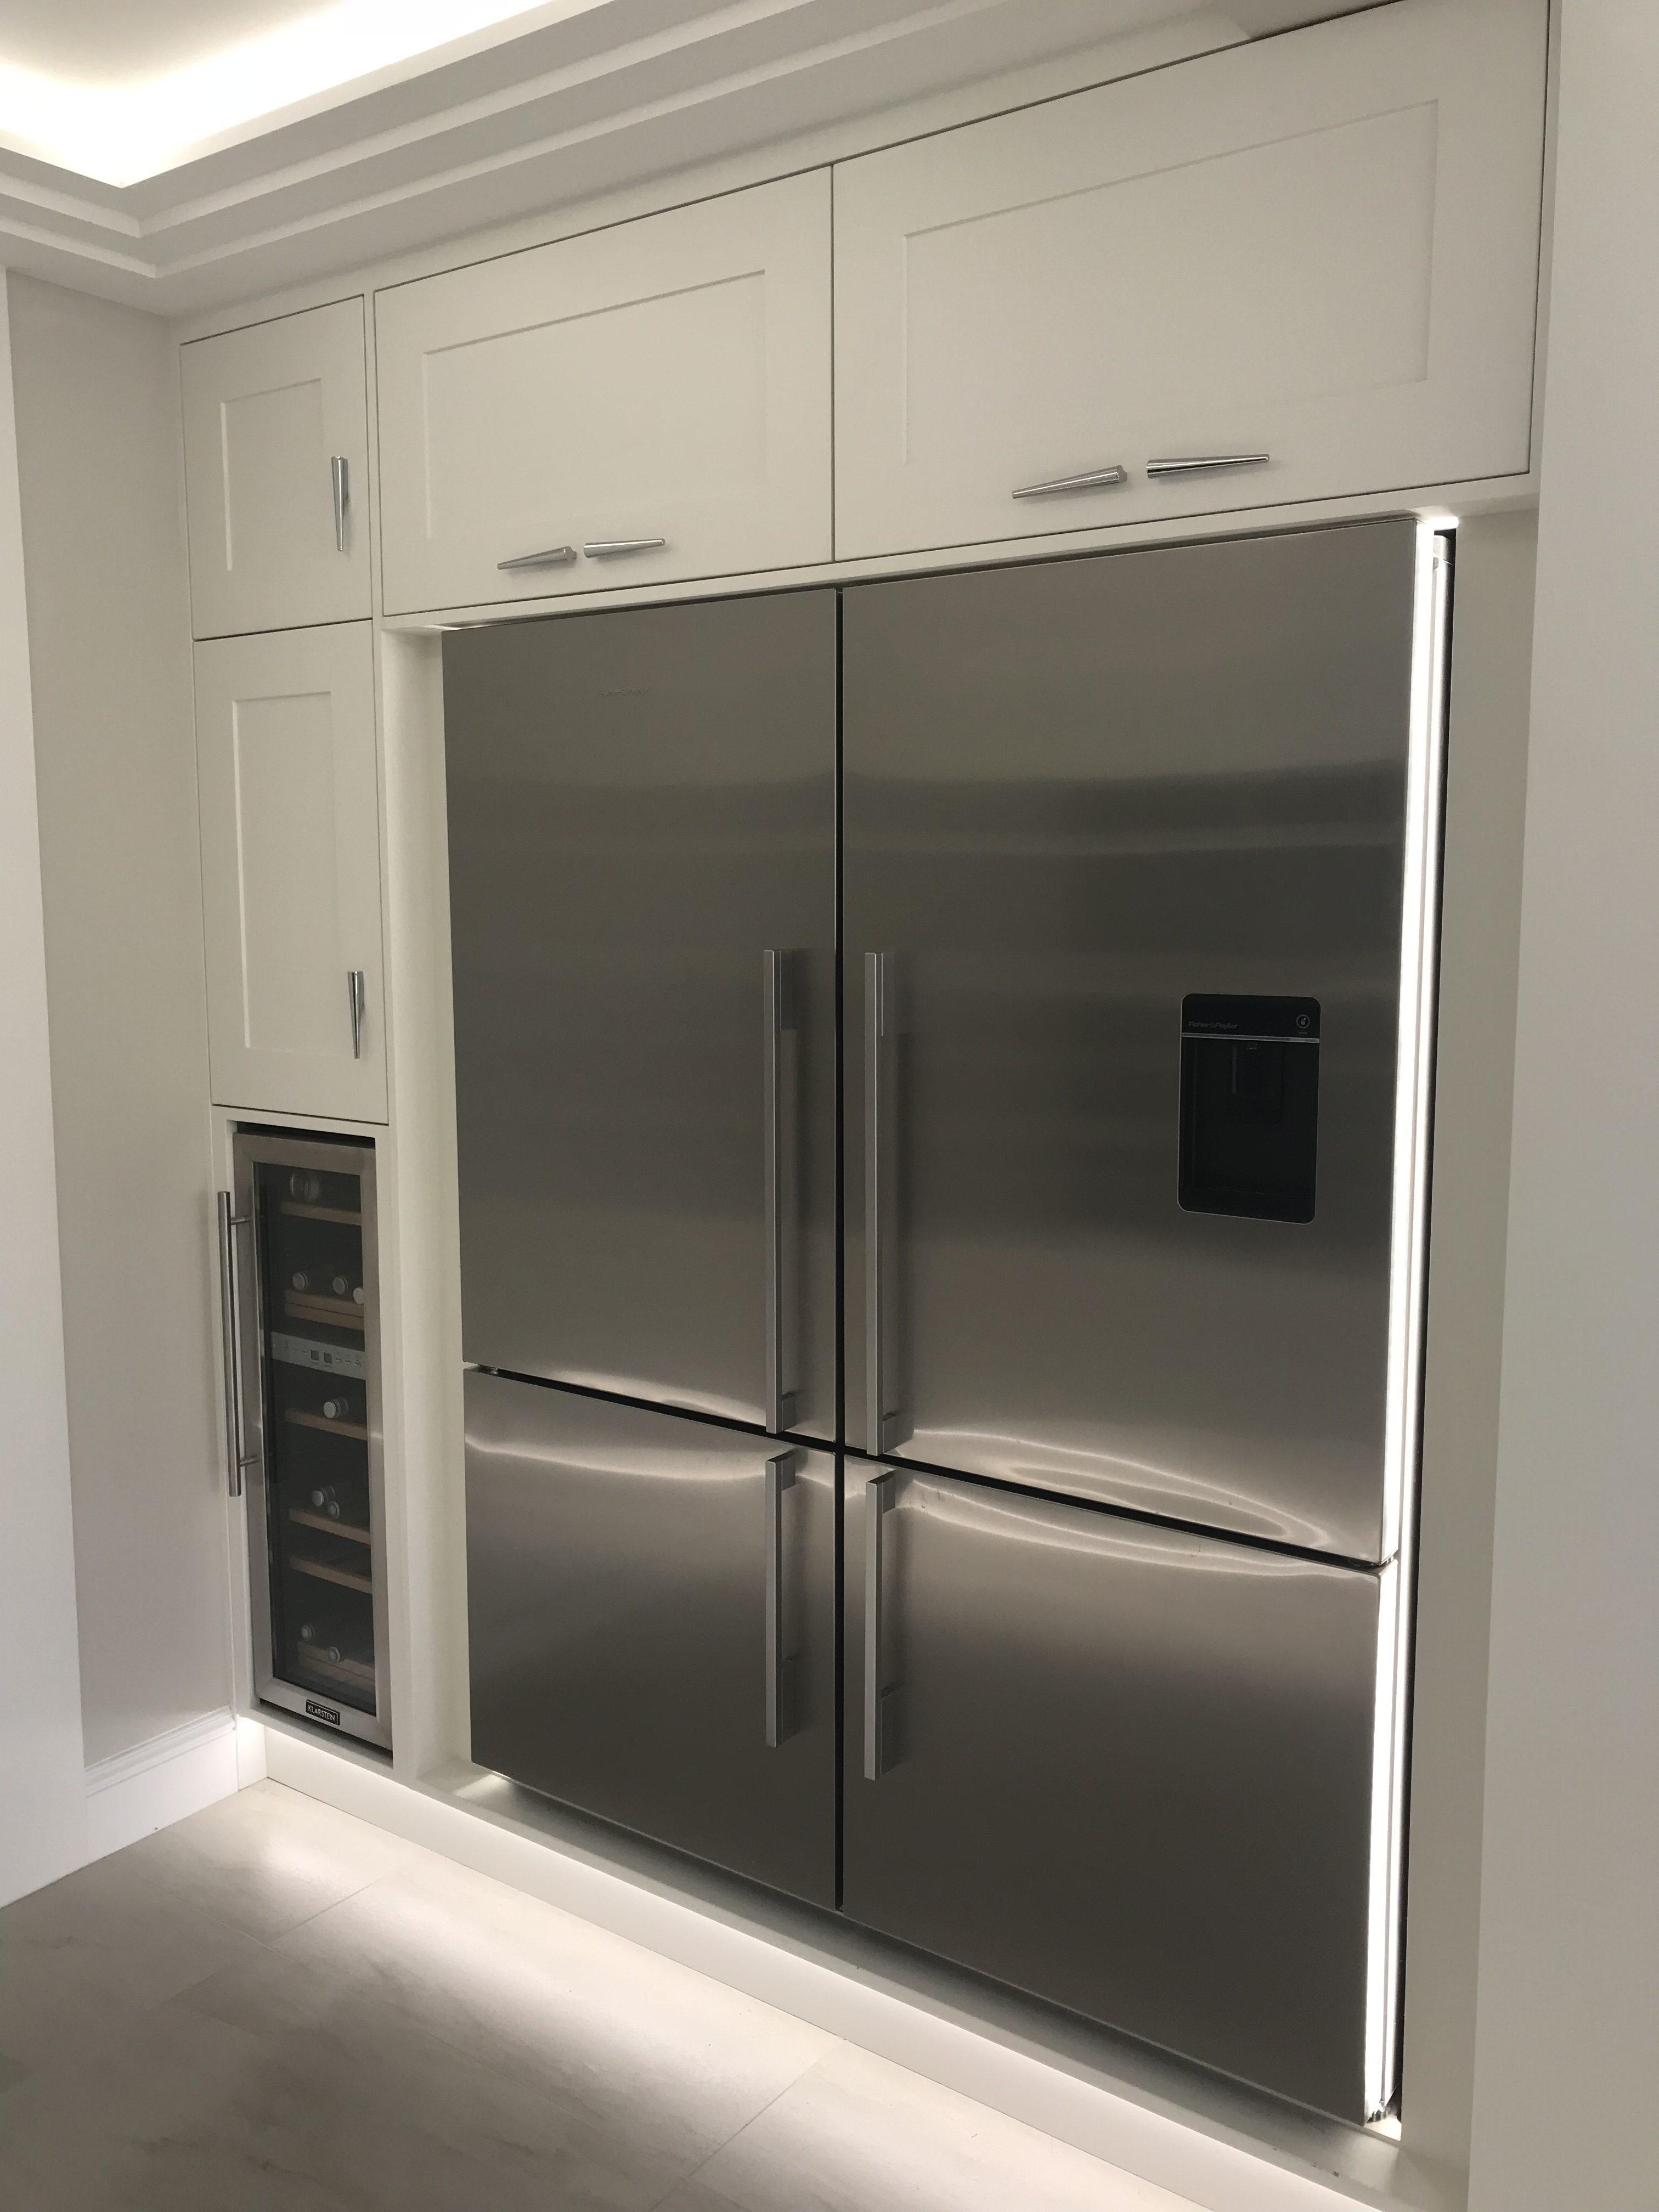 larder fridge freezer cabinet